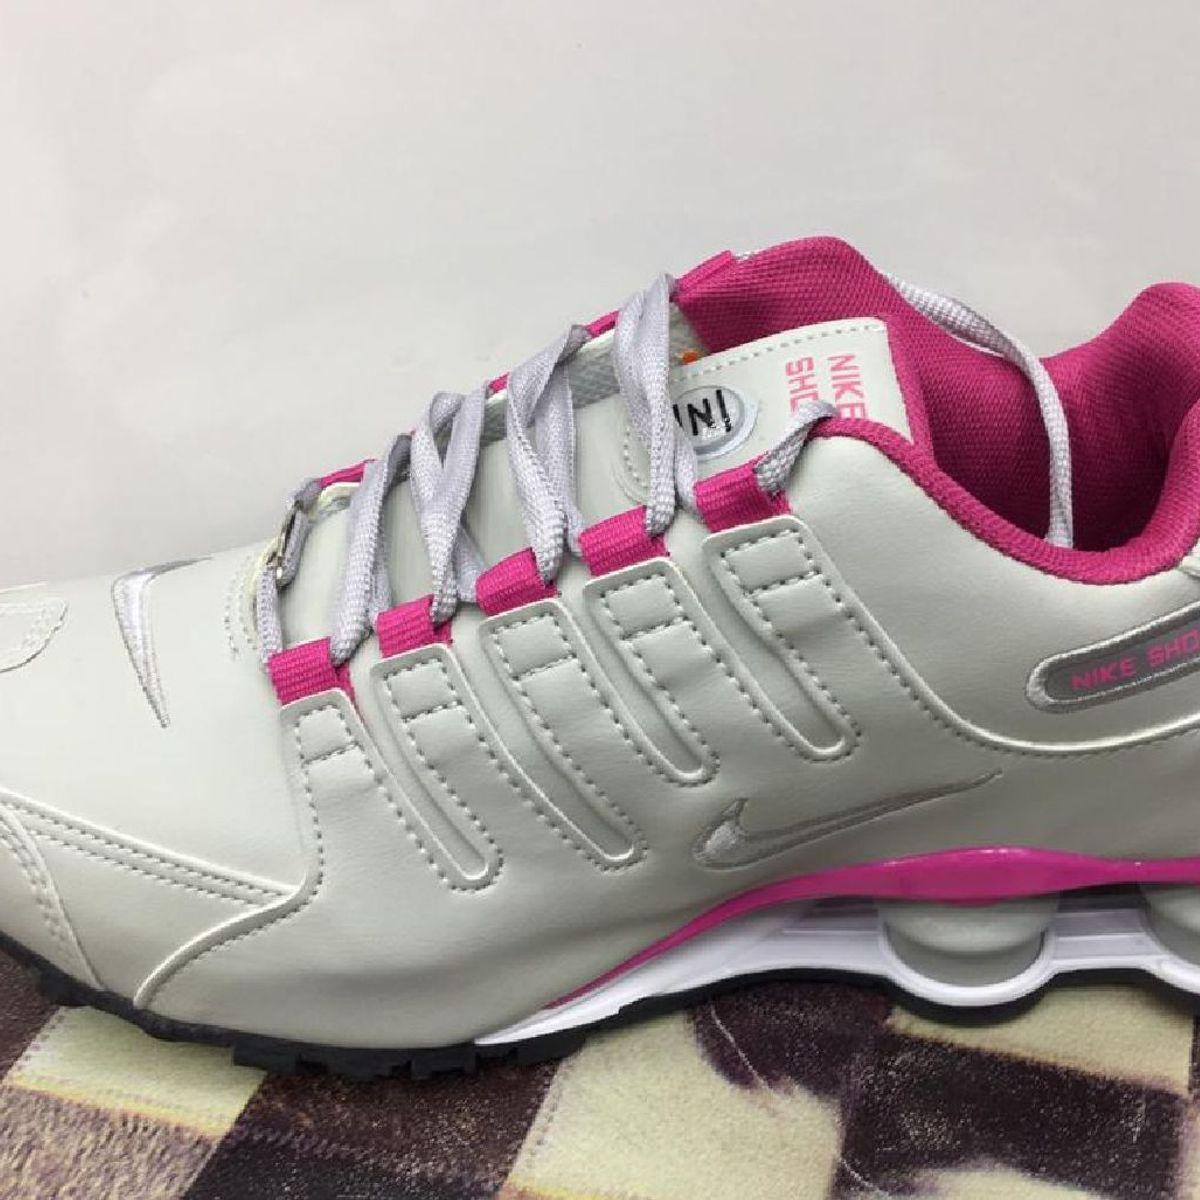 f5656b552a044 Tenis Nike Shox Nz Original Feminino Numero 35 | Tênis Feminino Nike Nunca  Usado 33409752 | enjoei